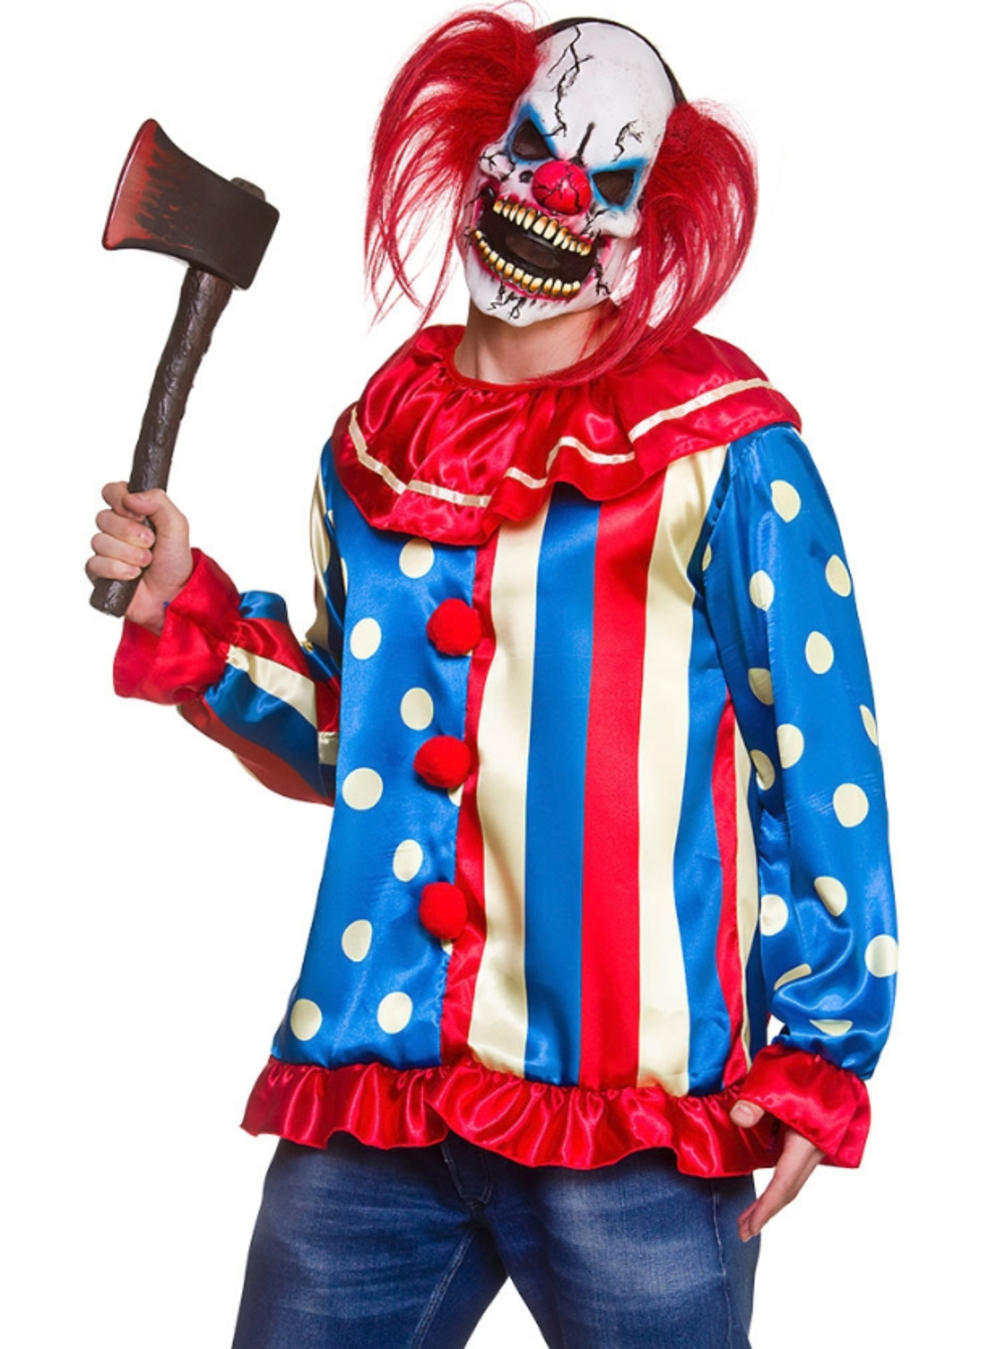 Krazy Killer Clown Mens Fancy Dress Circus Horror Adult Halloween Costume Outfit